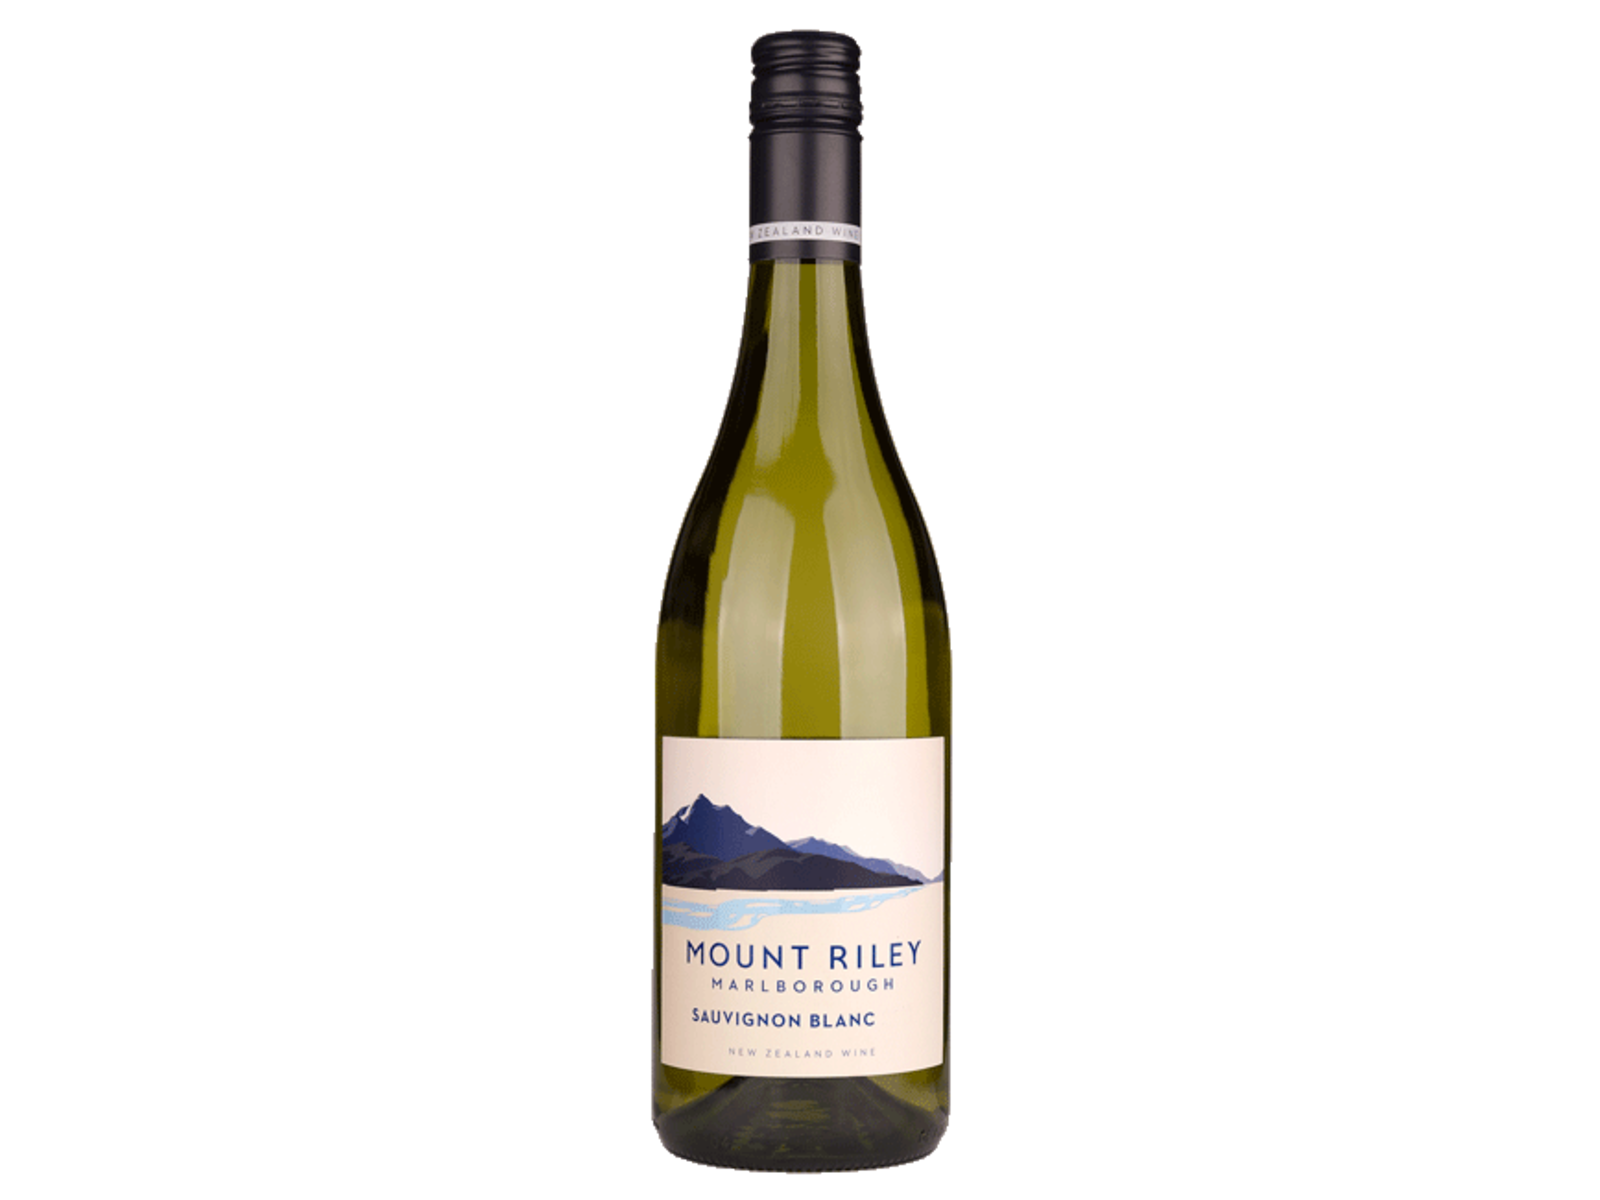 Mount Riley Mount Riley Sauvignon Blanc